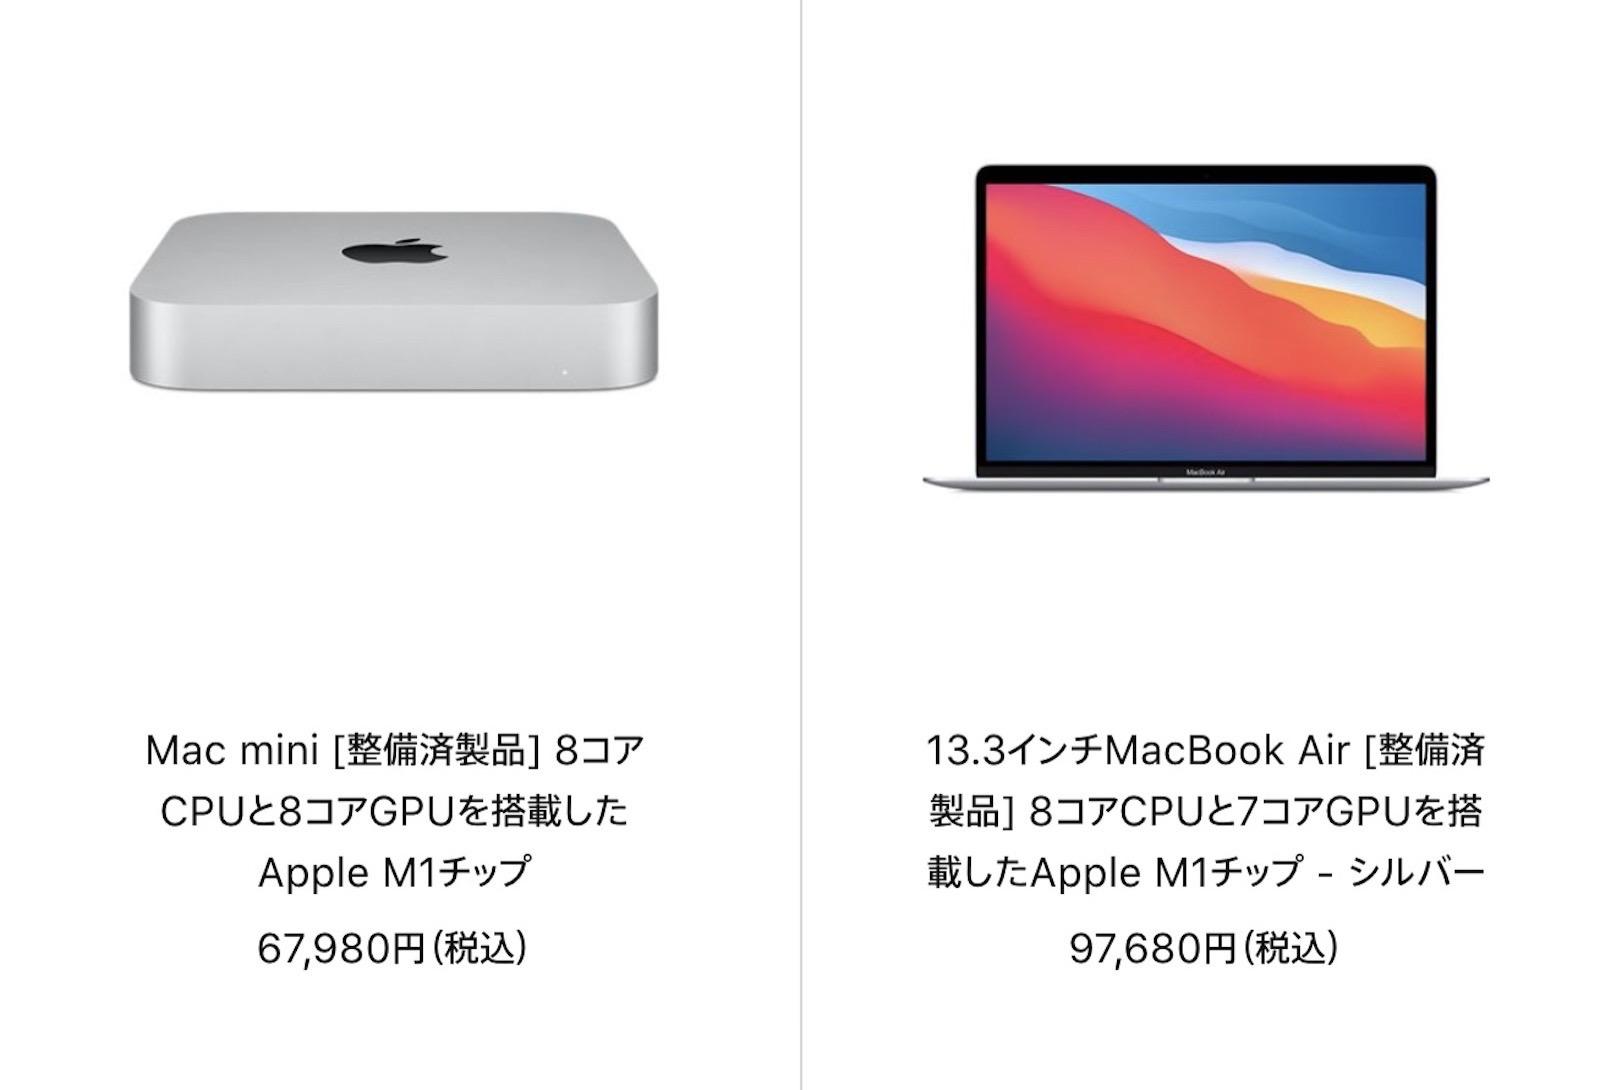 Mac min and macbook air refurbished 20210419